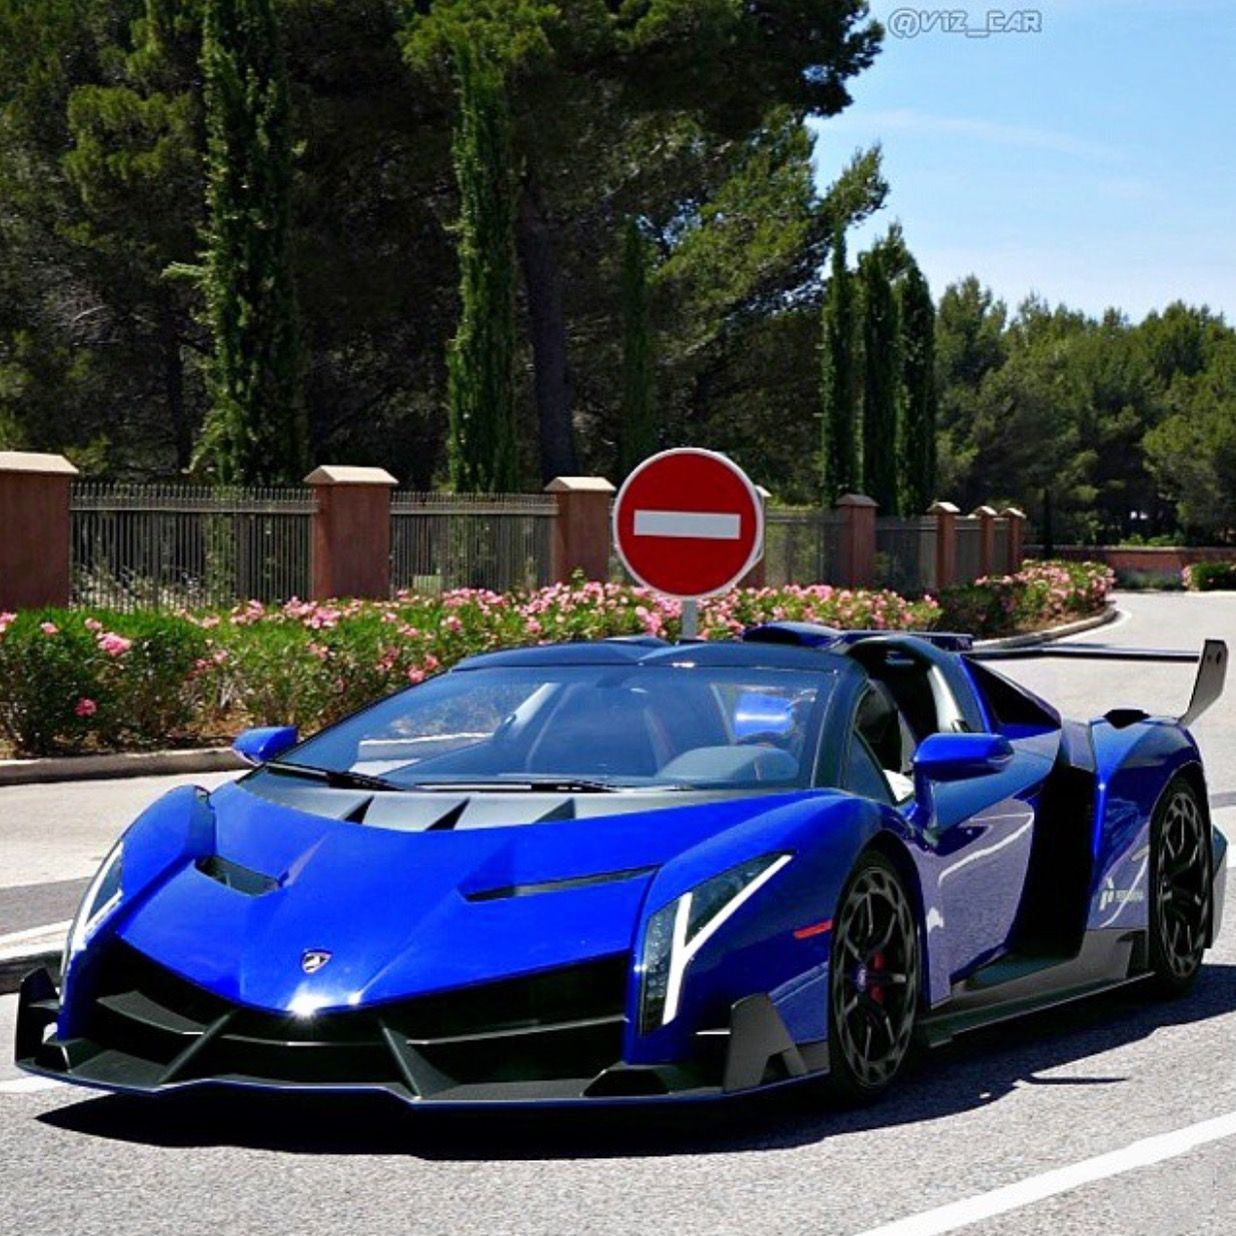 Cars Lamborghini: Lamborghini Veneno Painted In Rosso Veneno, But